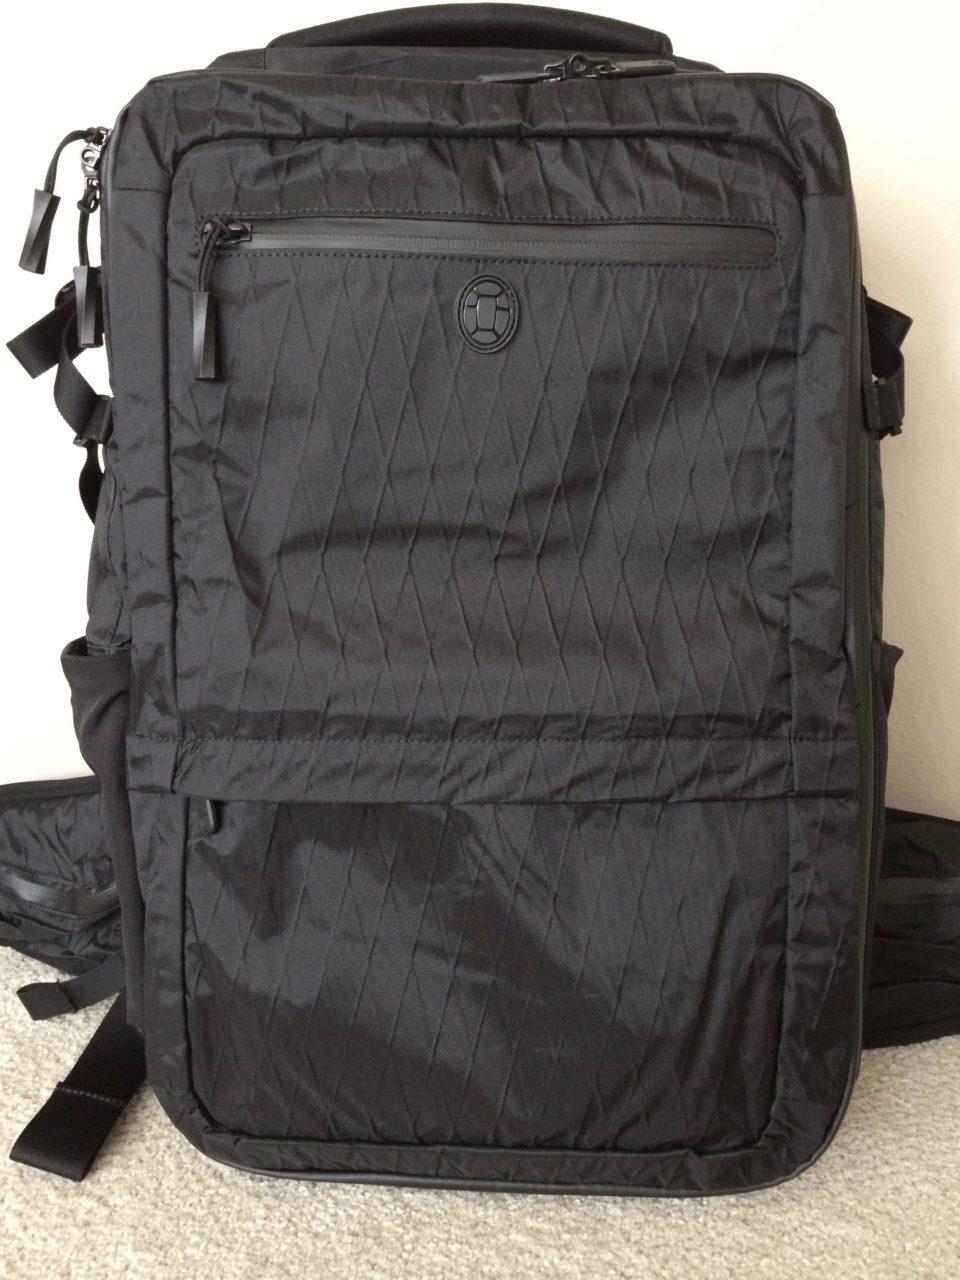 Tortuga Outbreaker Backpack front panel